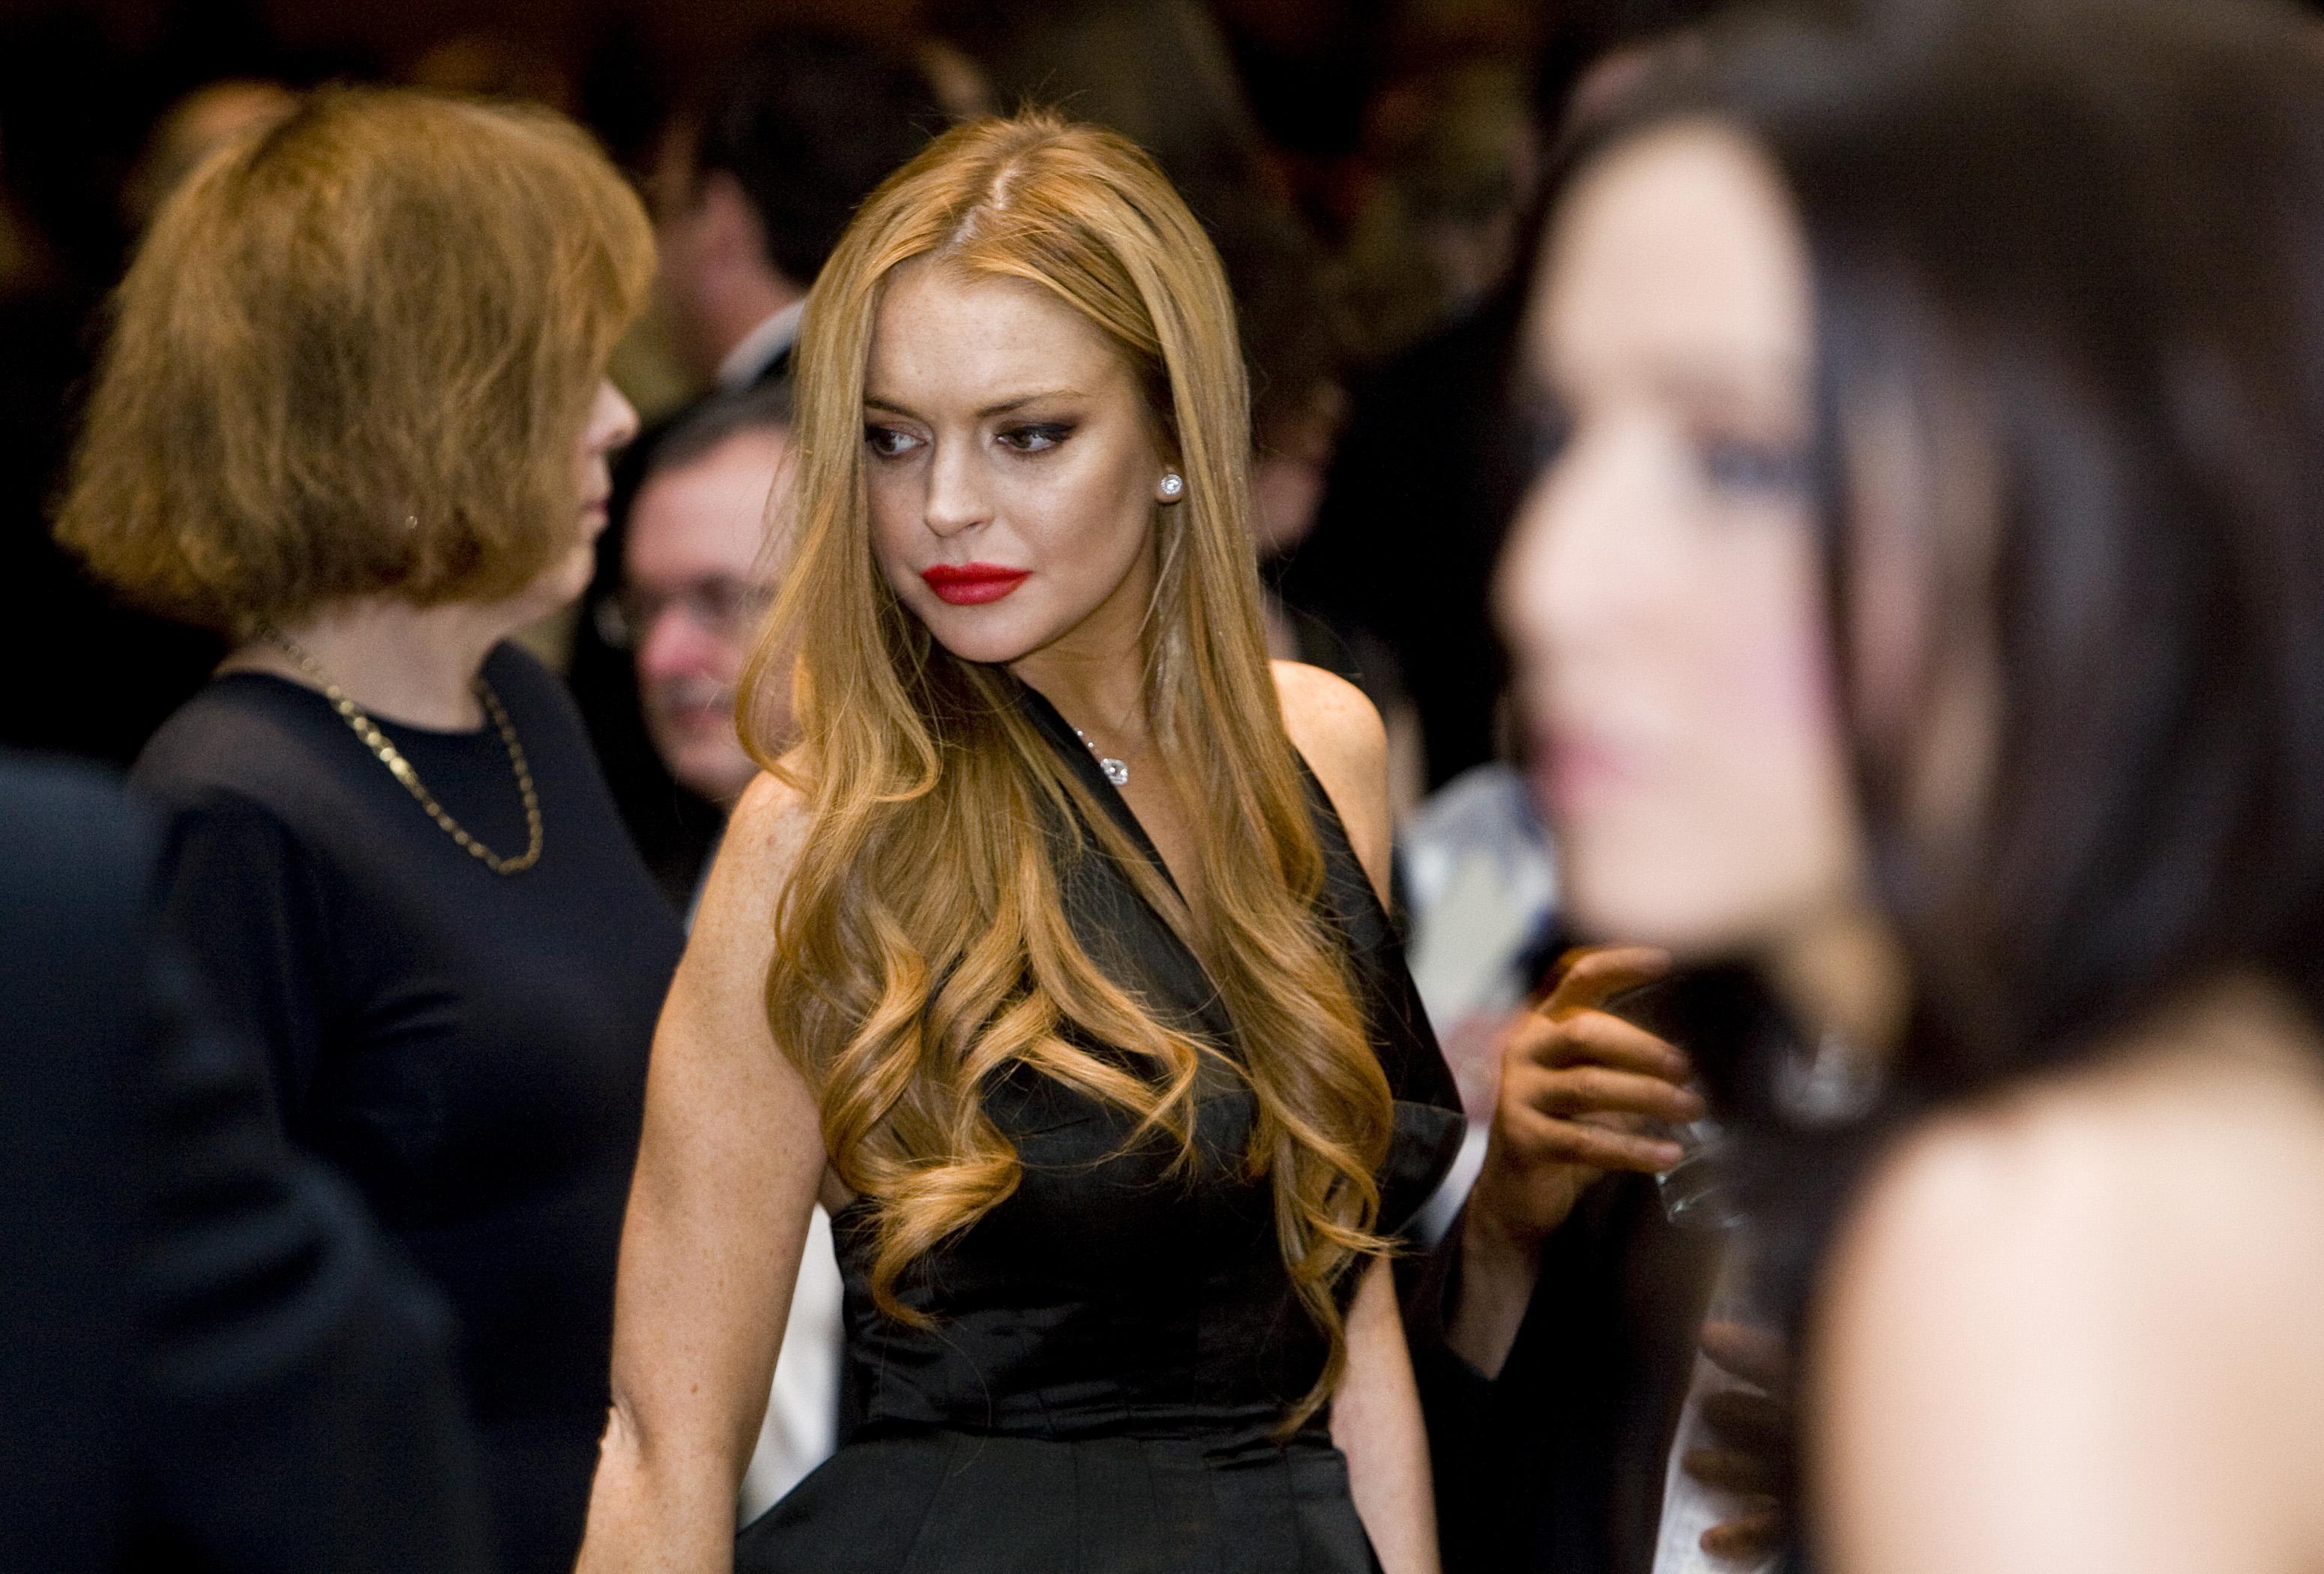 News: Lindsay Lohan's Photoshop Flub The Best Hair Brush forYou